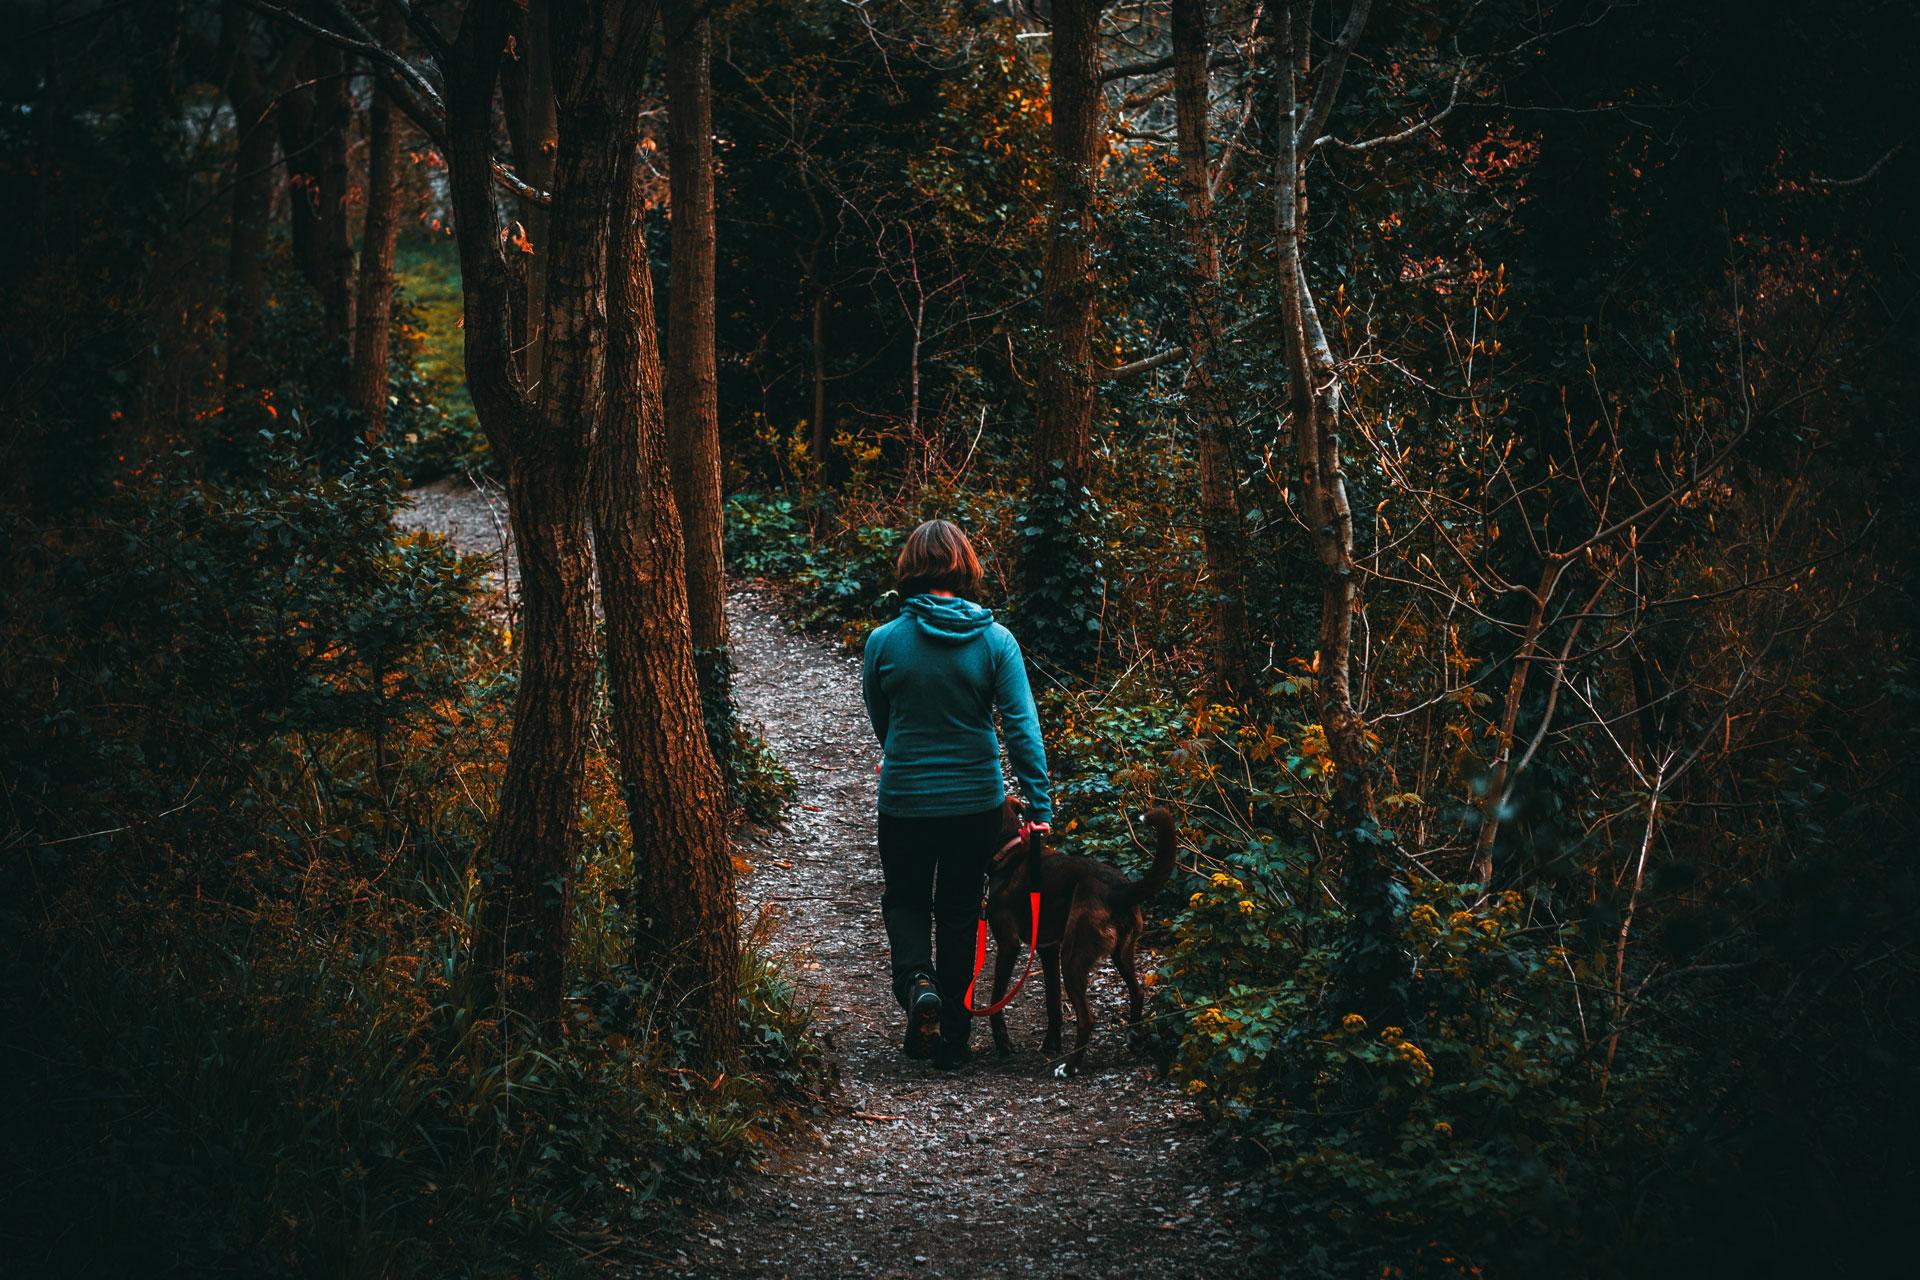 woman-walking-through-woods-with-dog.jpg